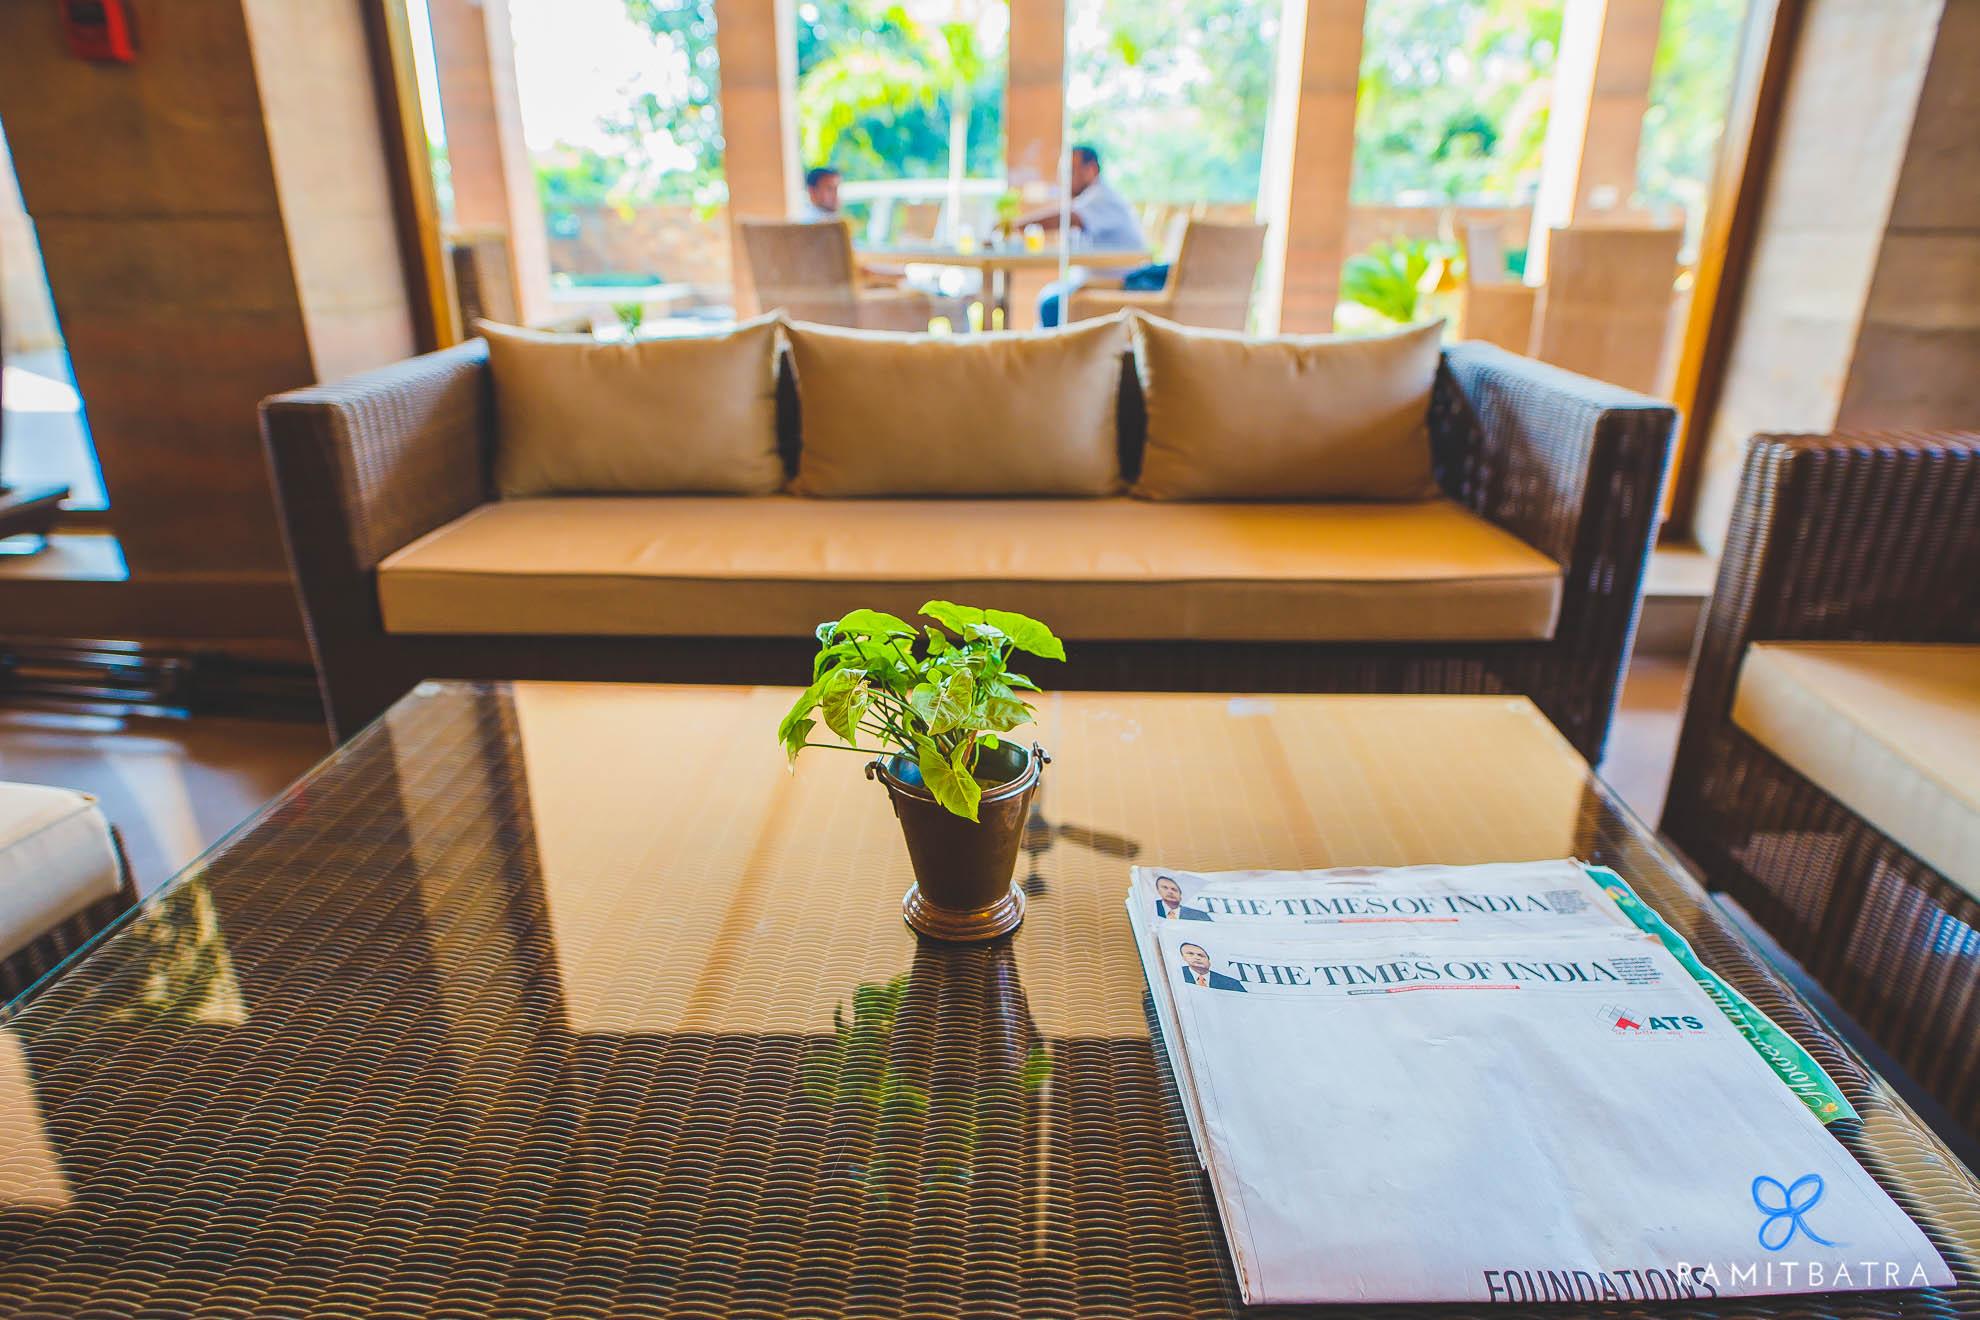 lalit-mangar-hotel-near-delhi-ramitbatra-003